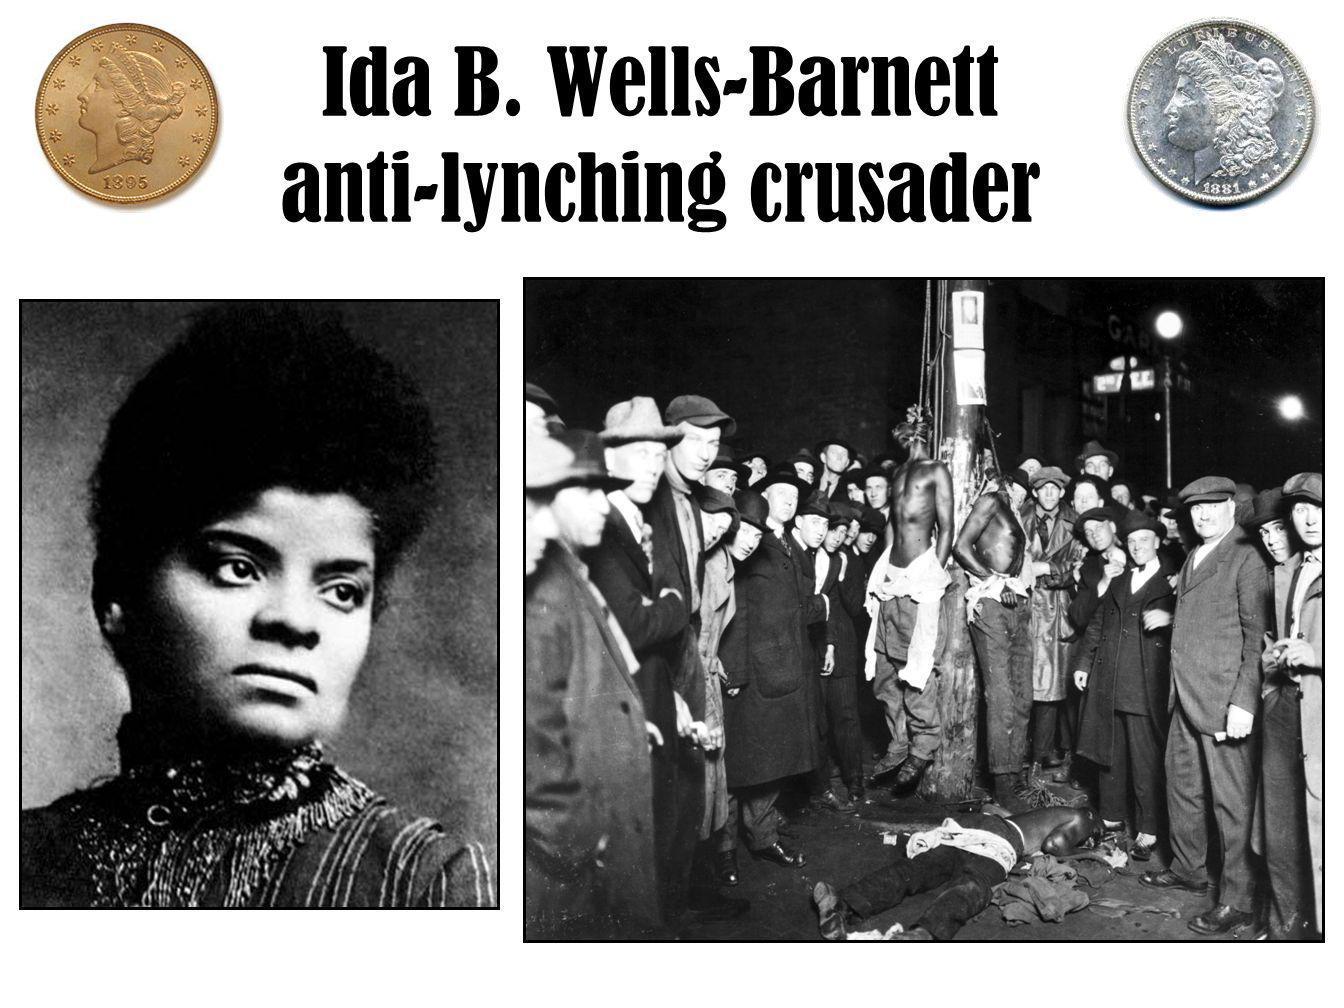 Ida B. Wells-Barnett anti-lynching crusader